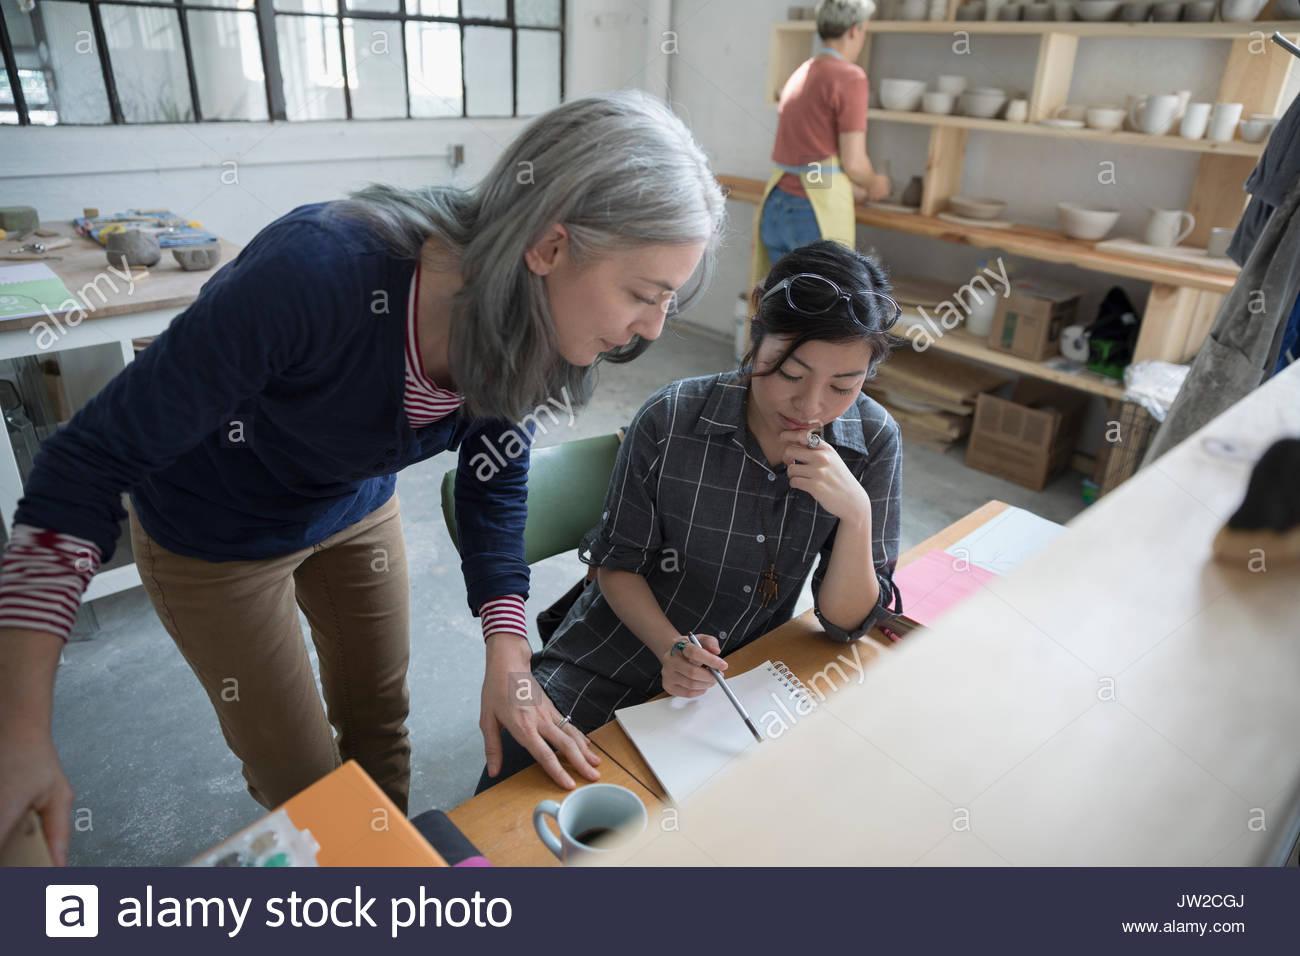 Female artists sketching at desk in art studio - Stock Image